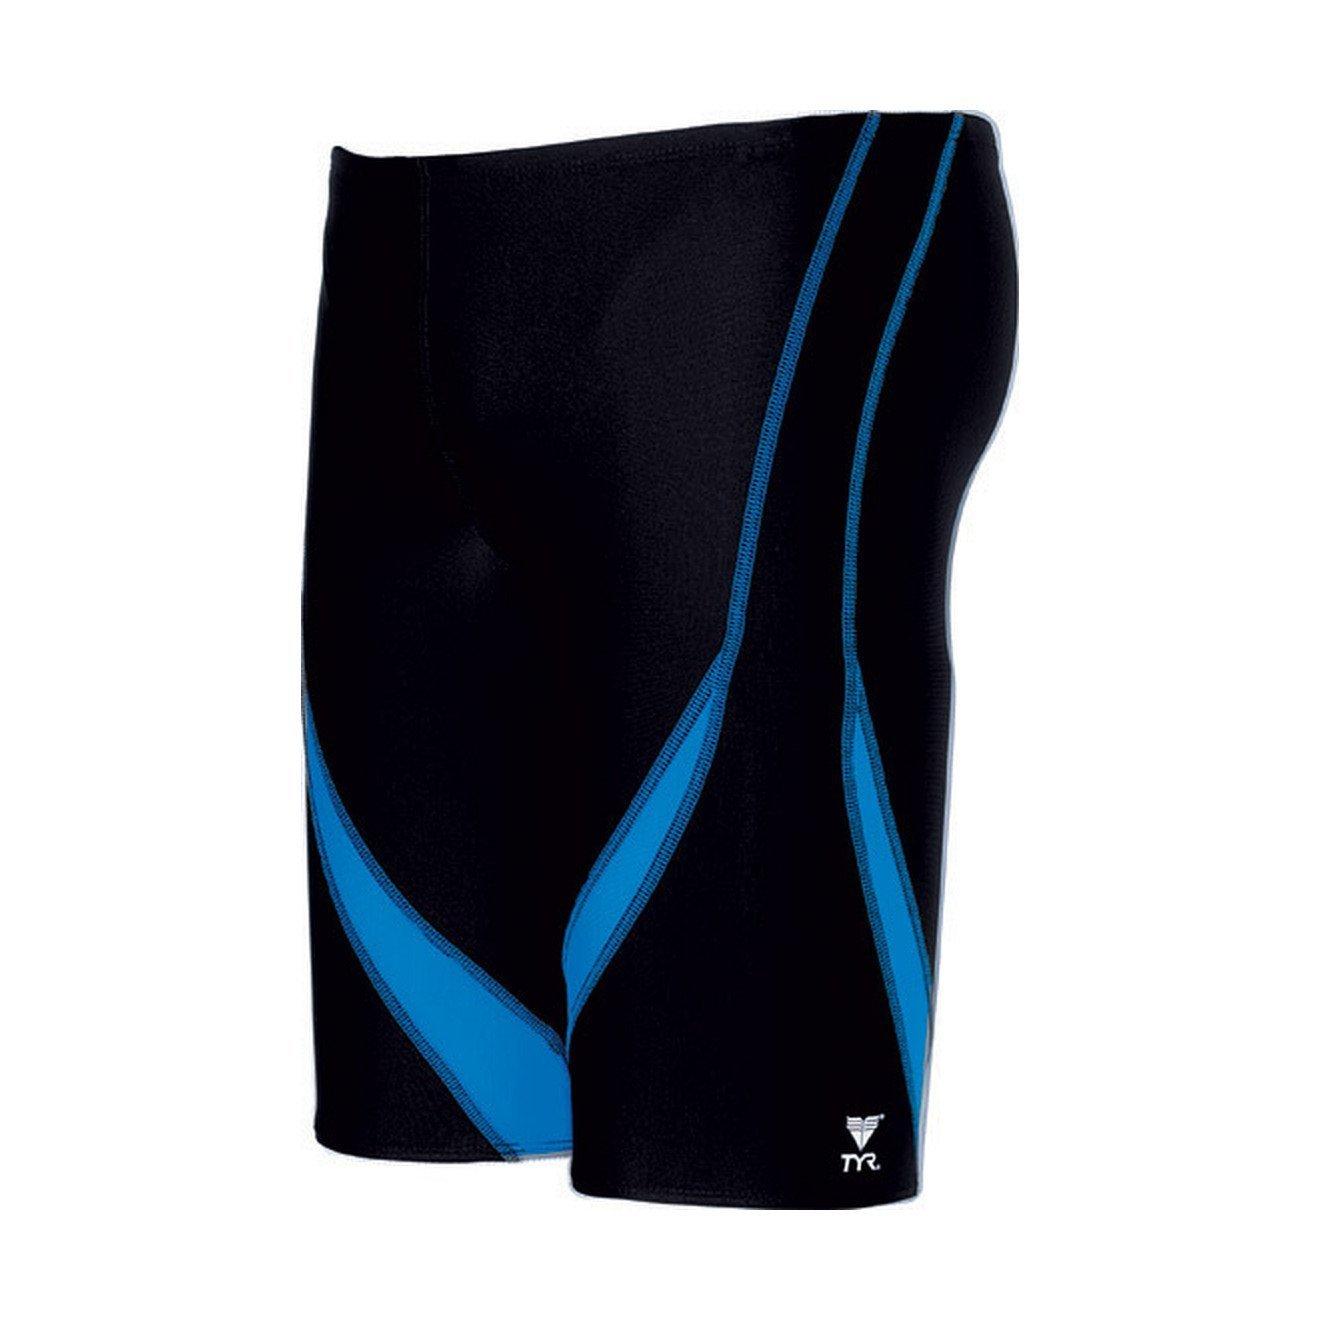 Tyr Alliance Splice Jammer Male Black/Blue 32 Medium by TYR